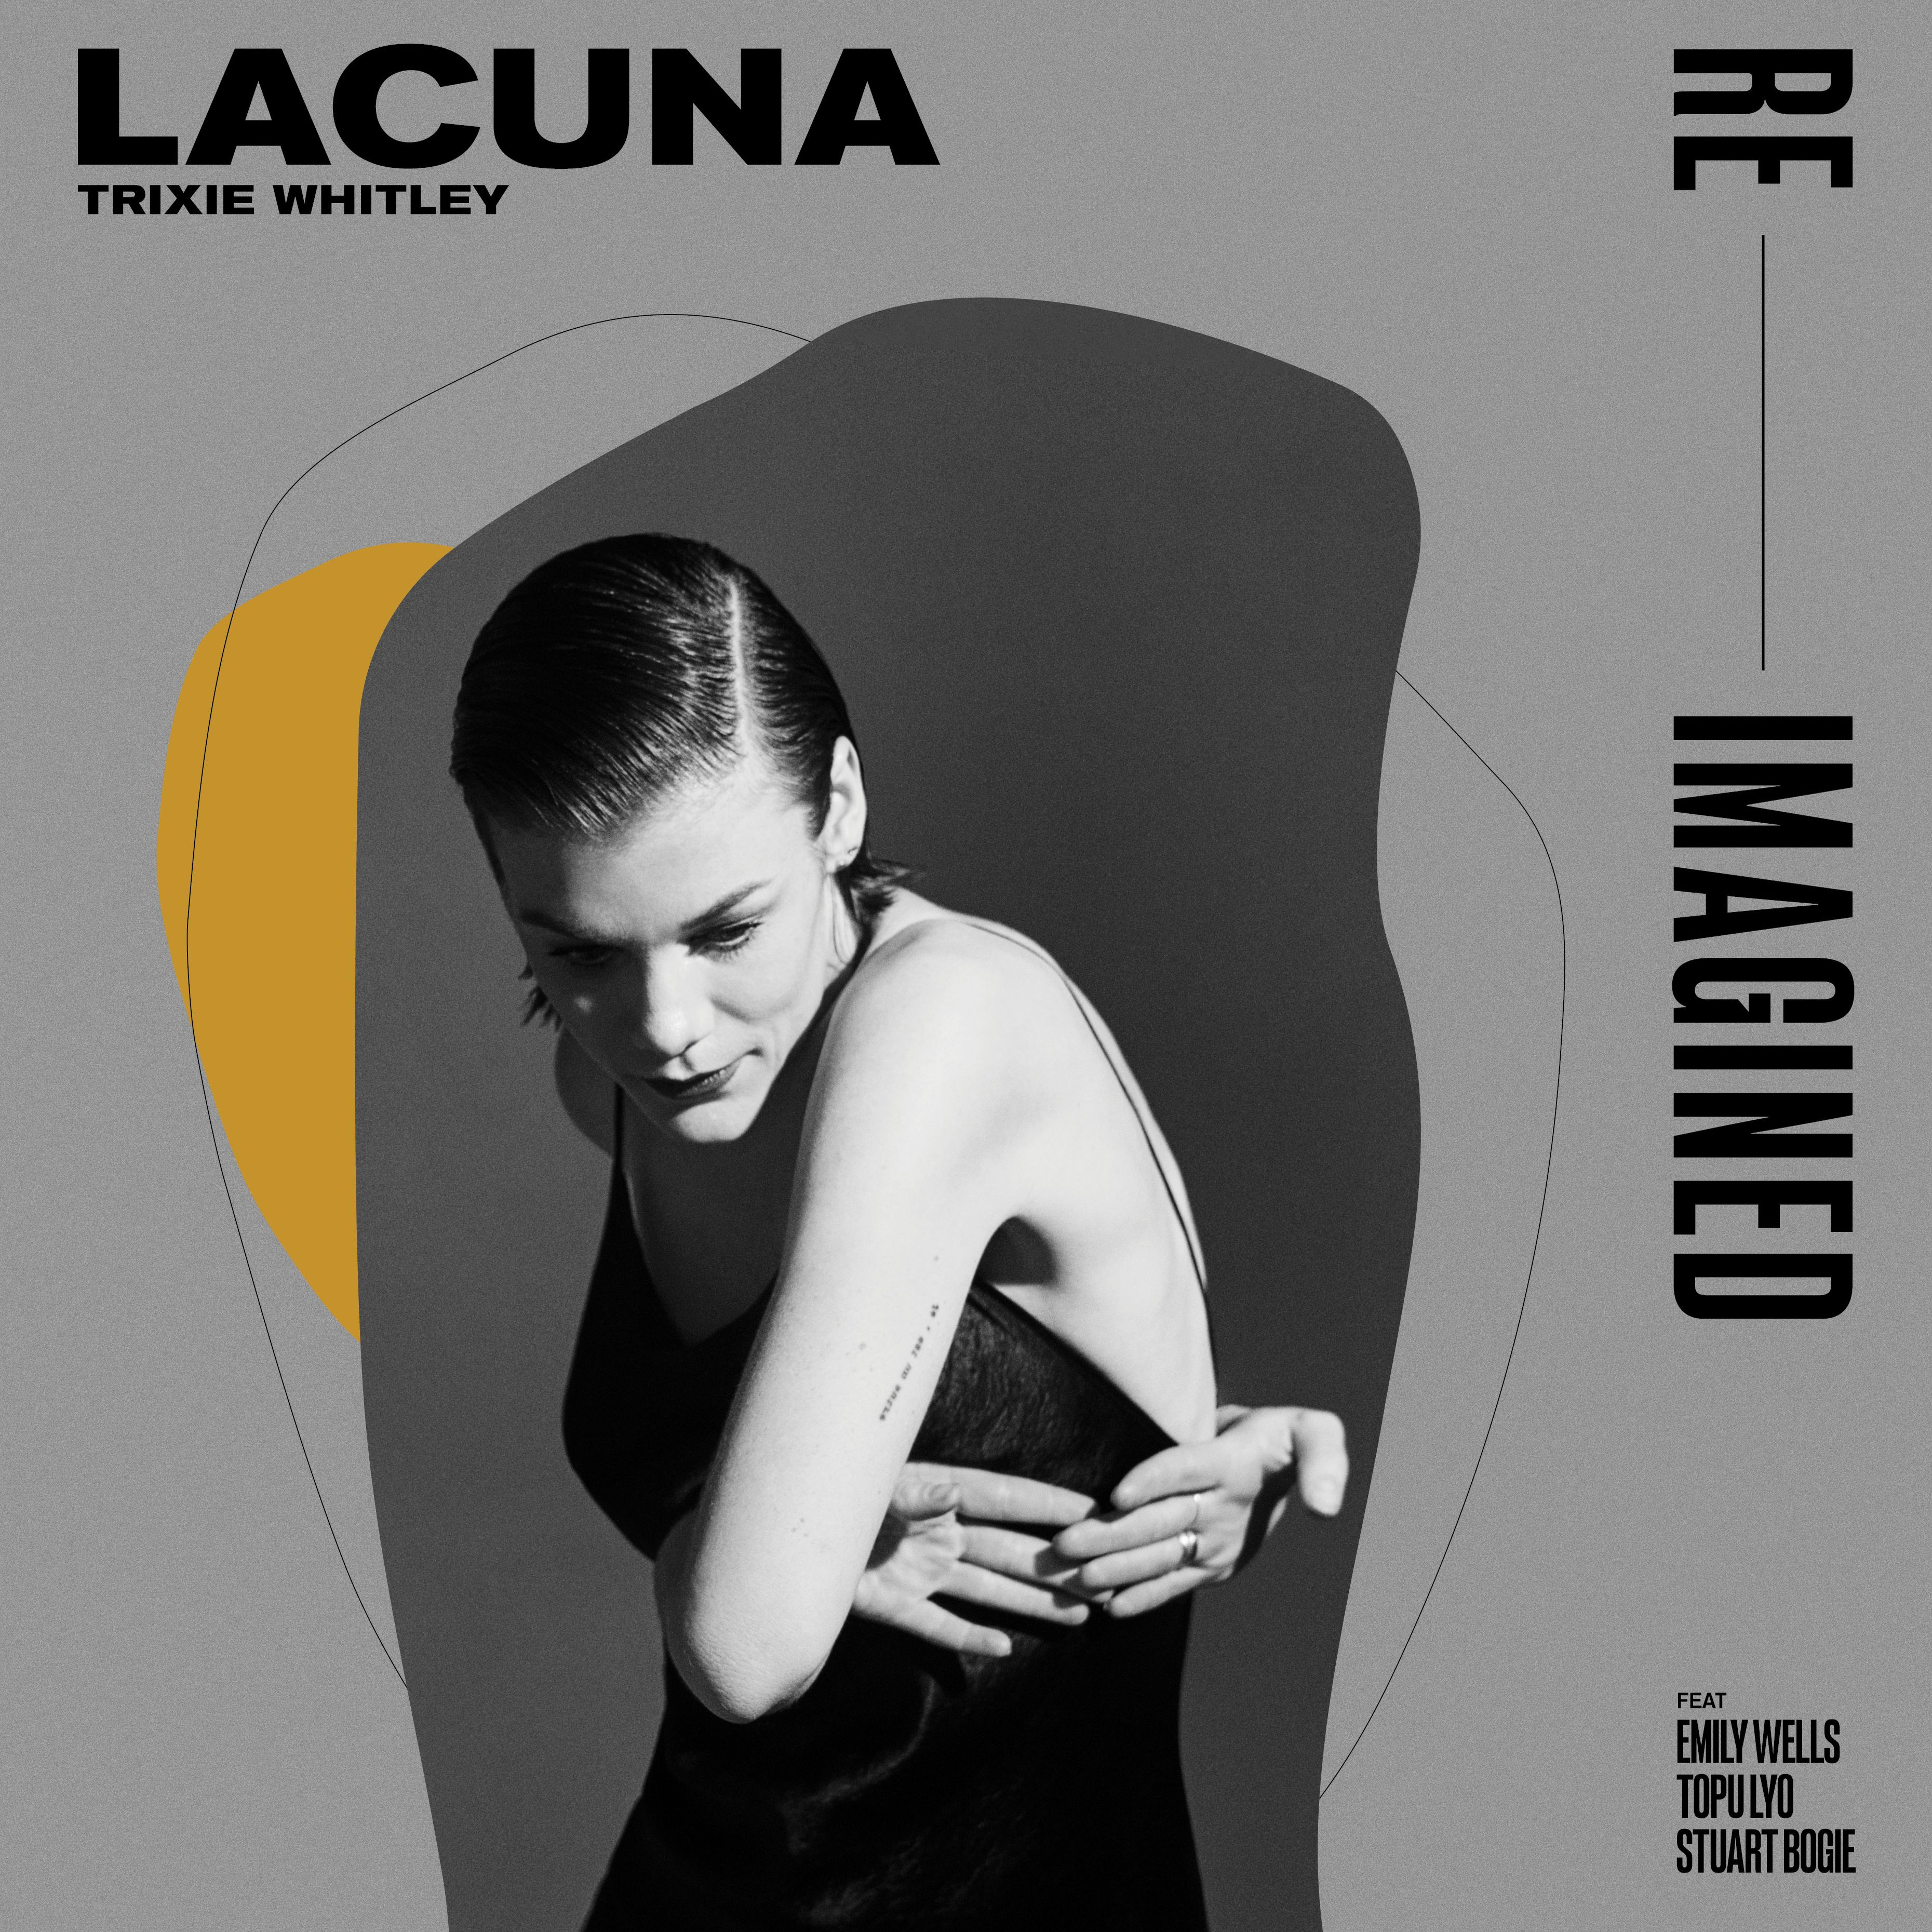 Lacuna (Re-Imagined) Image